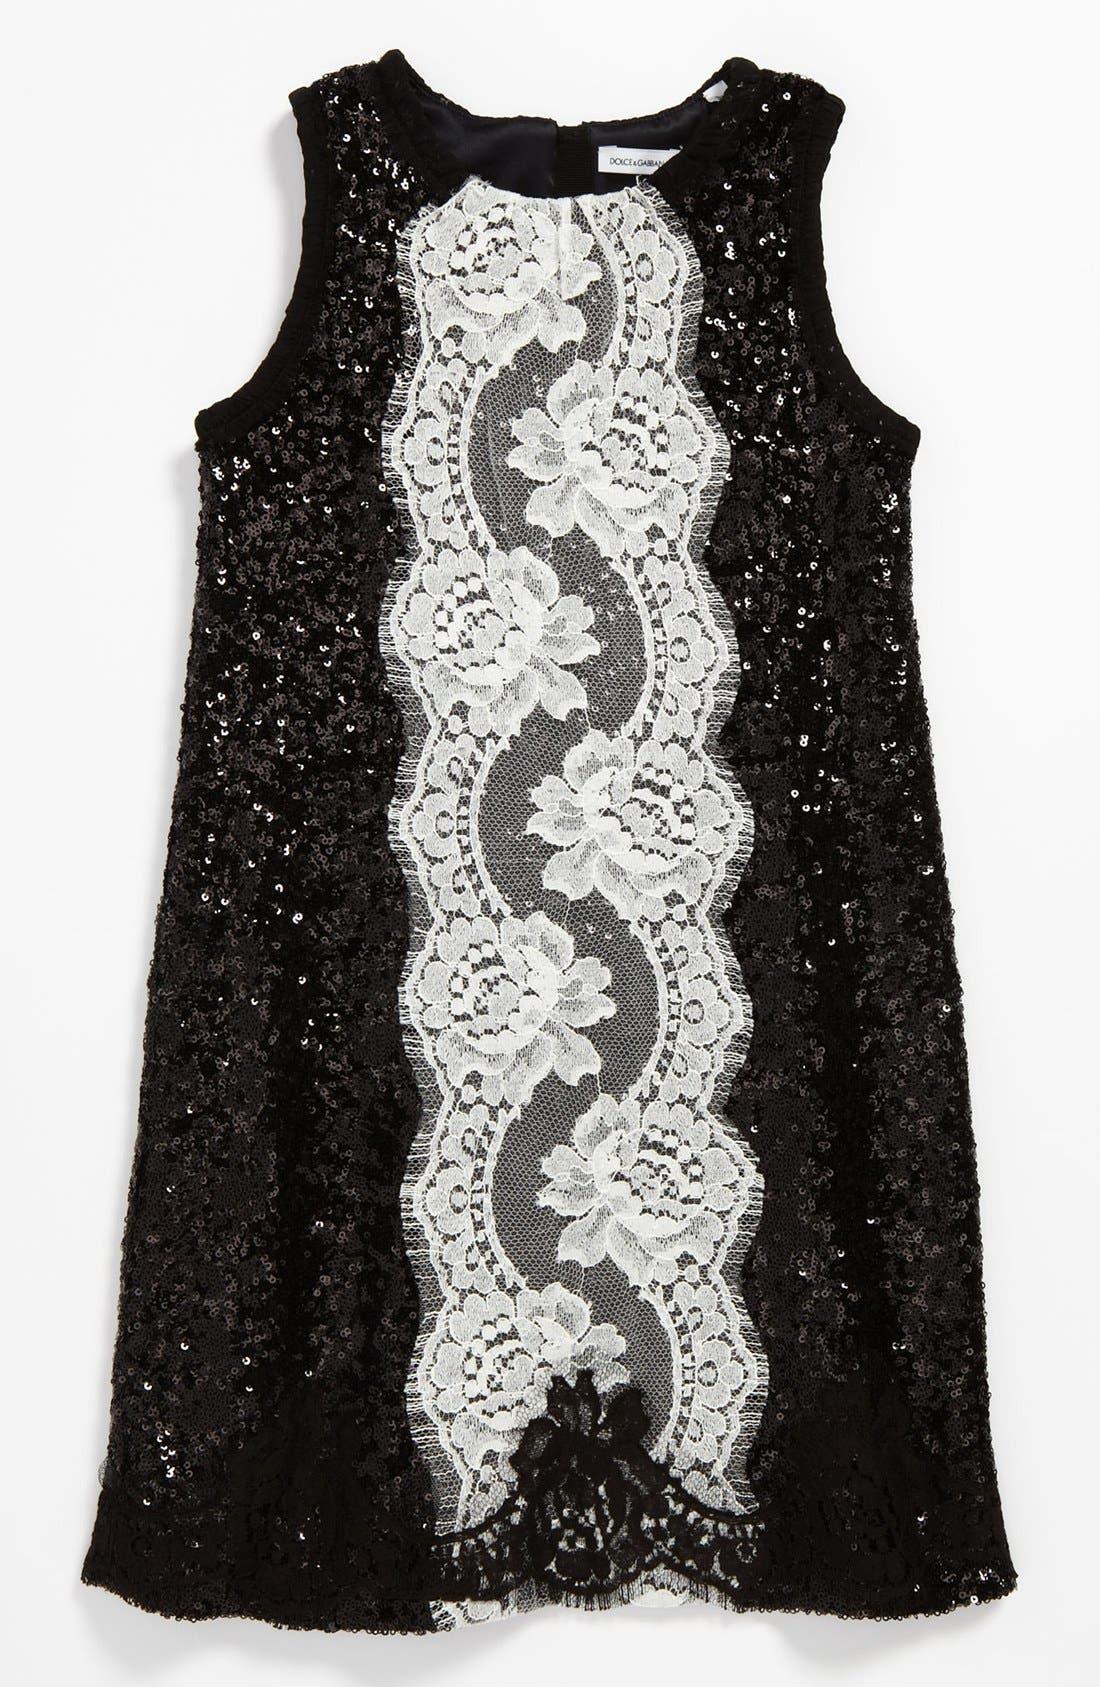 Alternate Image 1 Selected - Dolce&Gabbana Sequin Lace Dress (Little Girls & Big Girls)